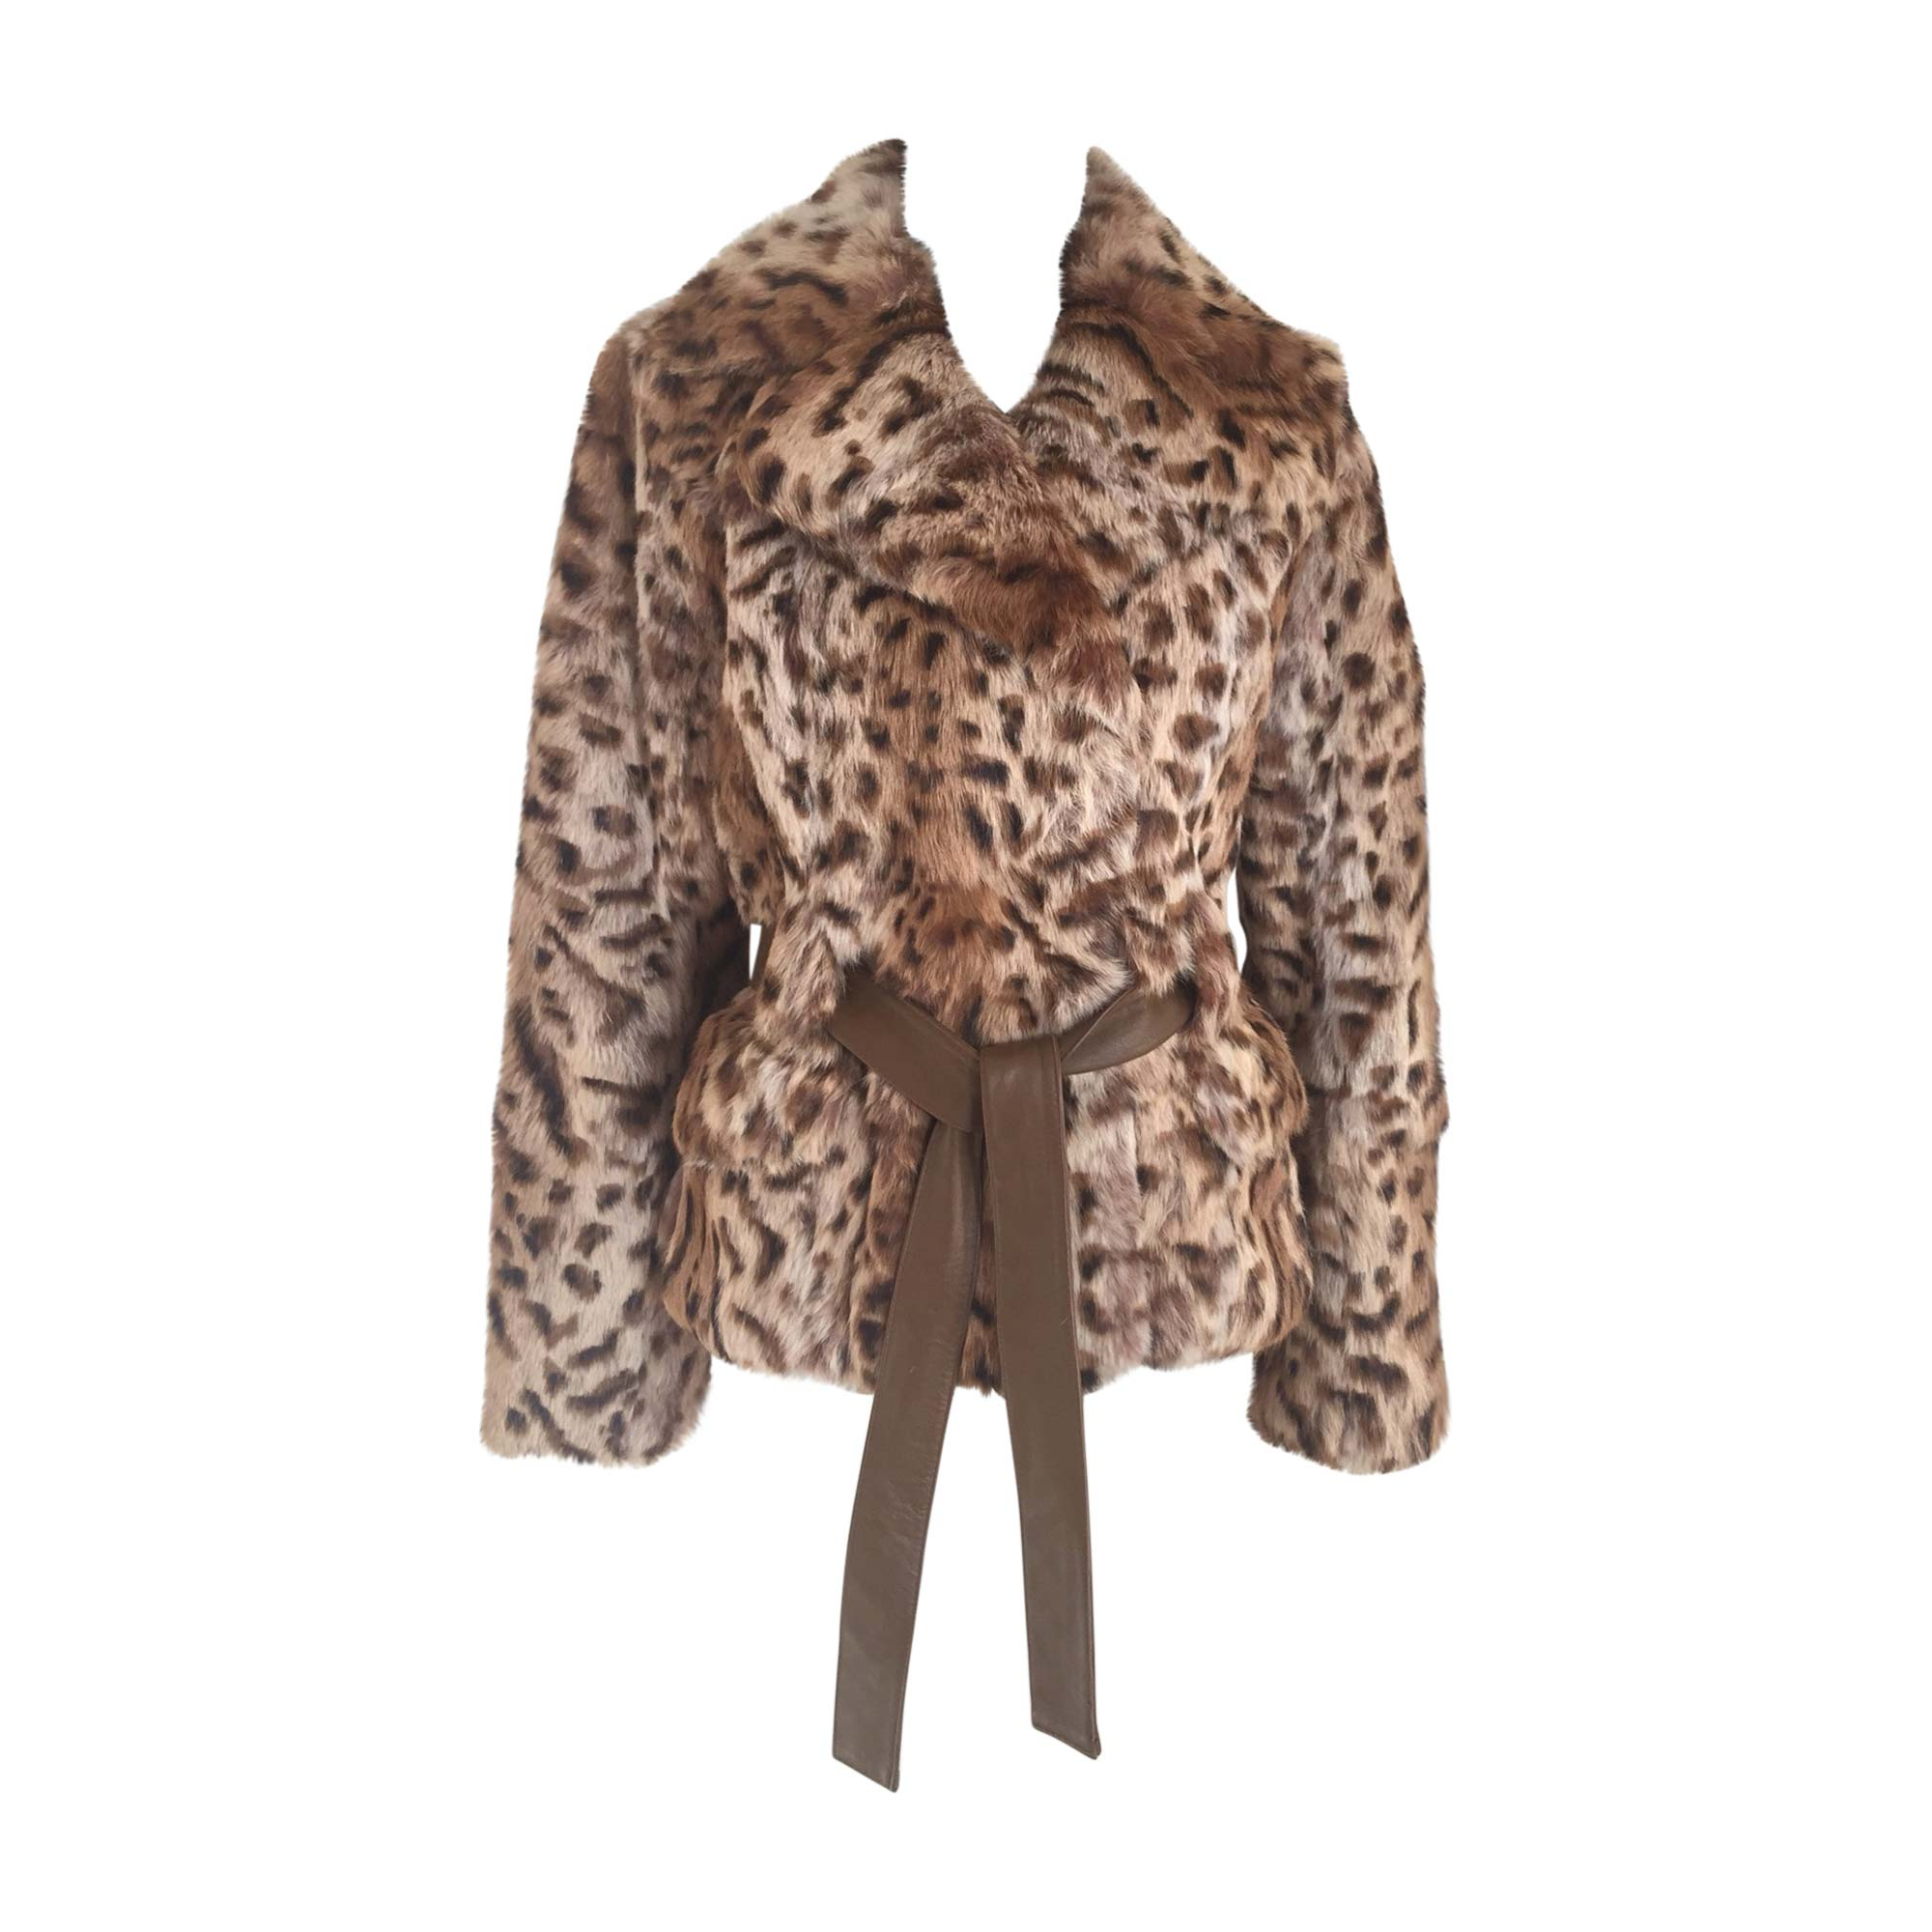 Manteau en fourrure YVES SALOMON Imprimés animaliers